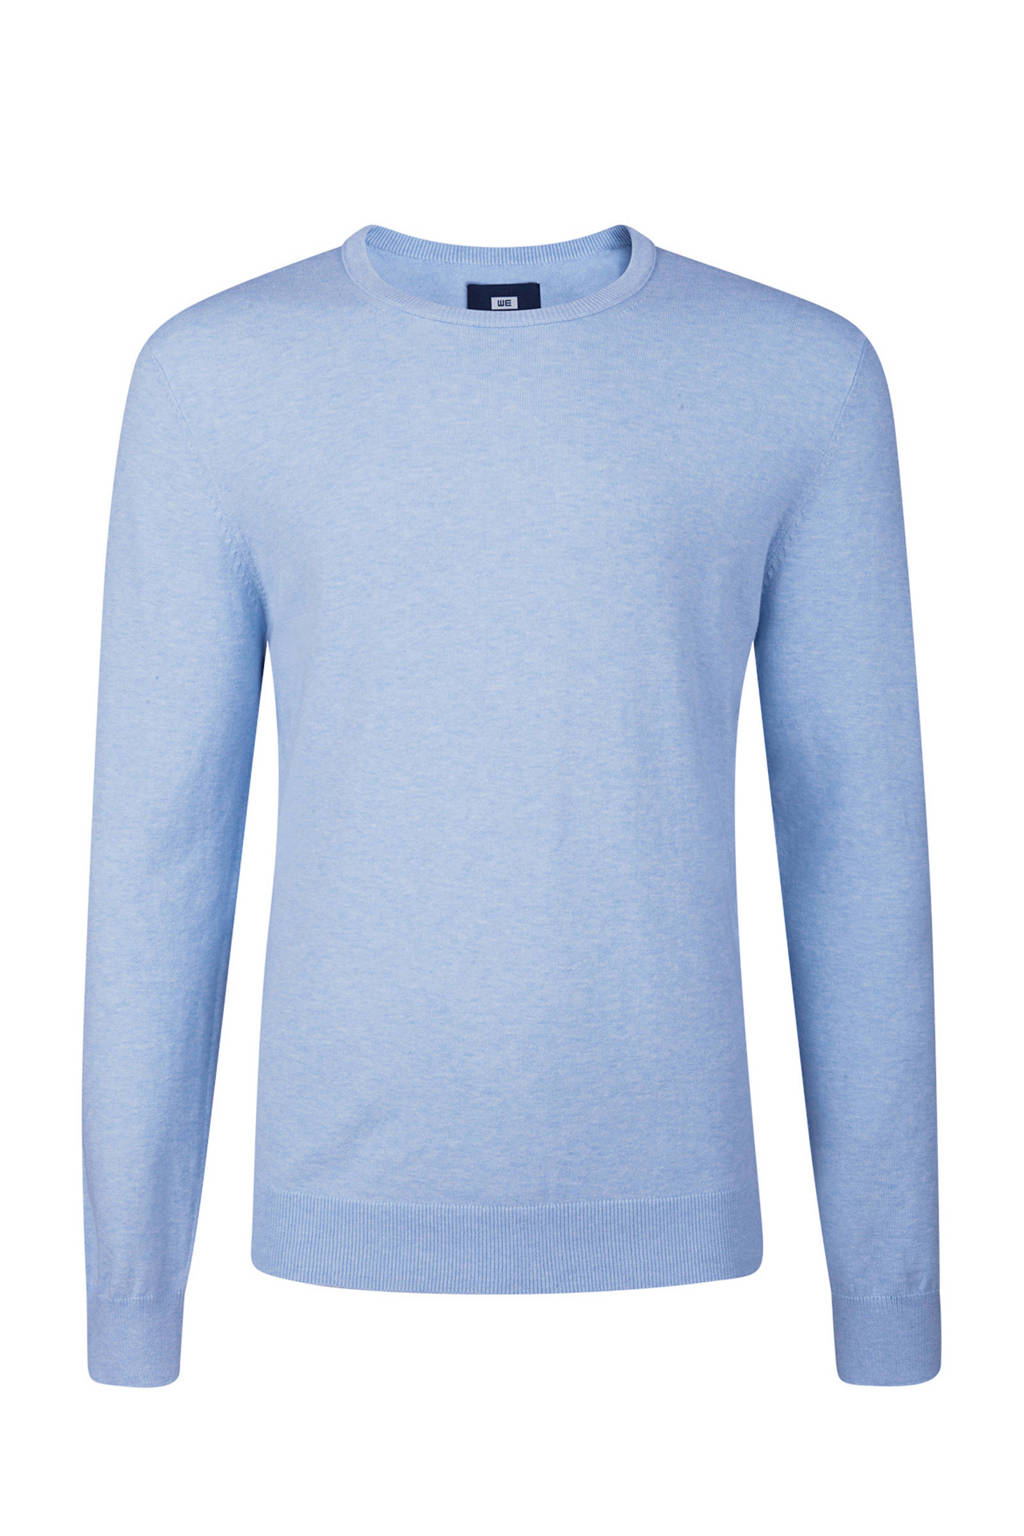 WE Fashion trui, Pale Blue Melange